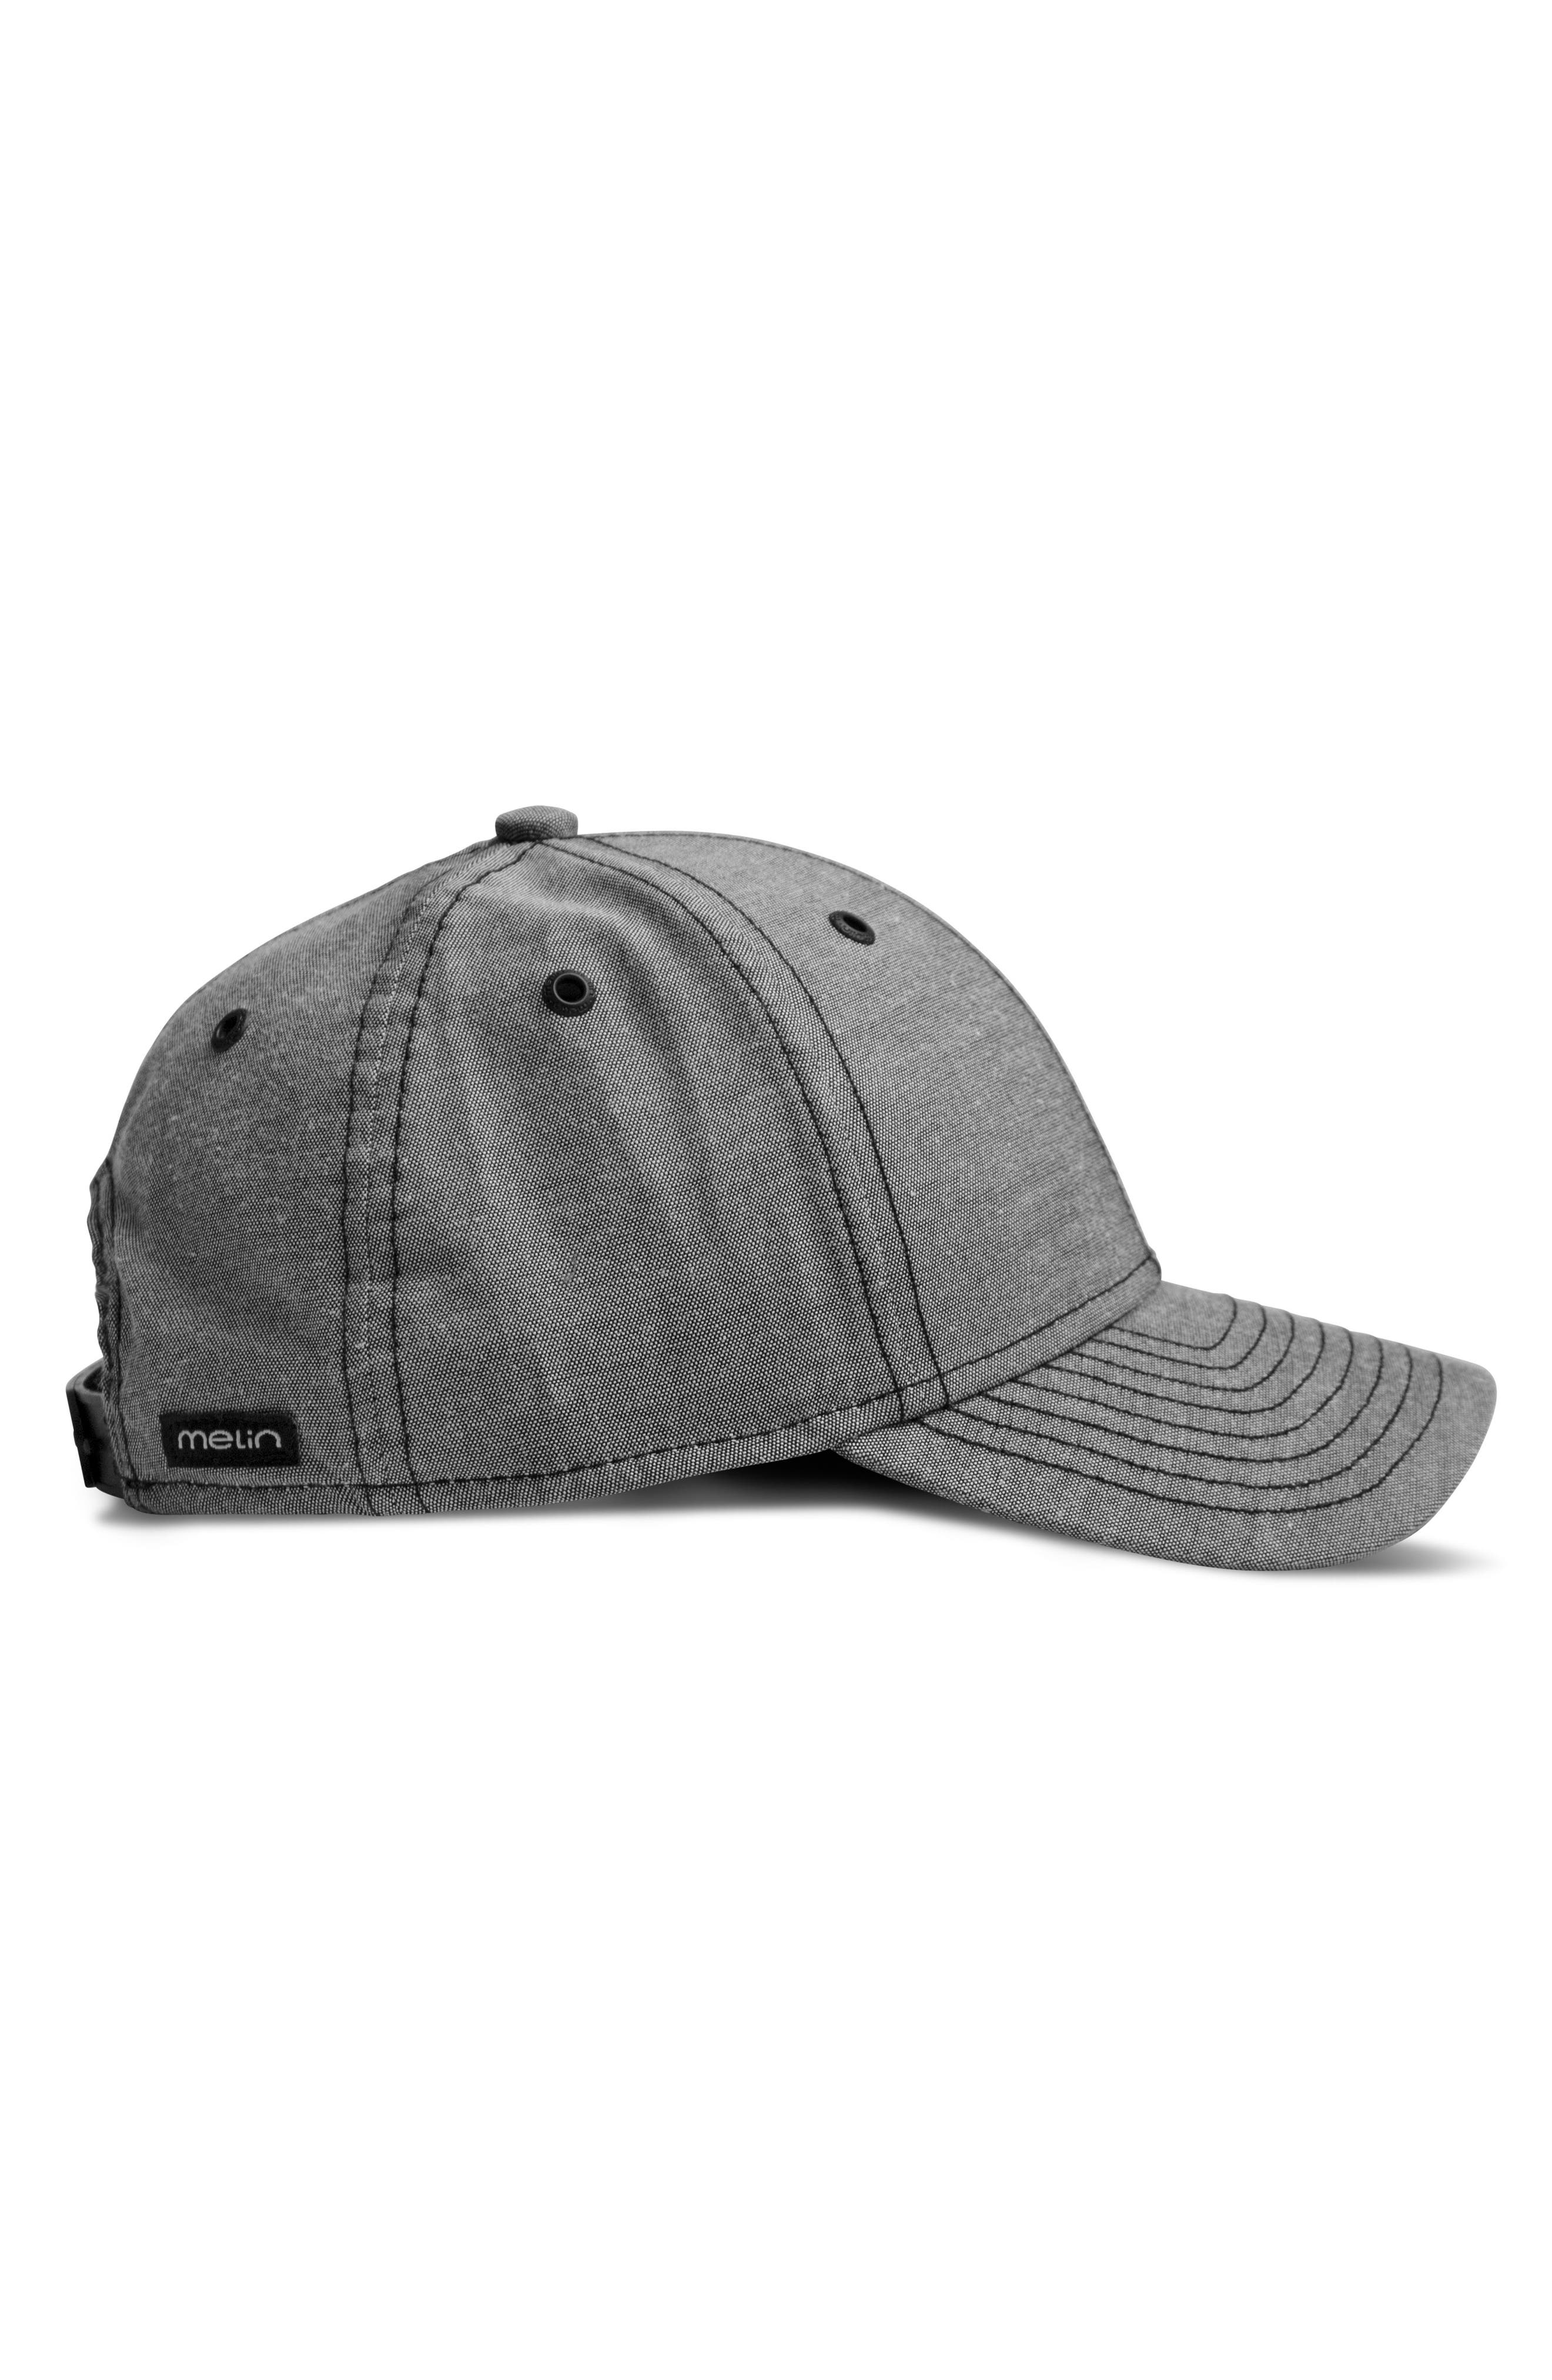 Scholar Snapback Baseball Cap,                             Alternate thumbnail 3, color,                             Black